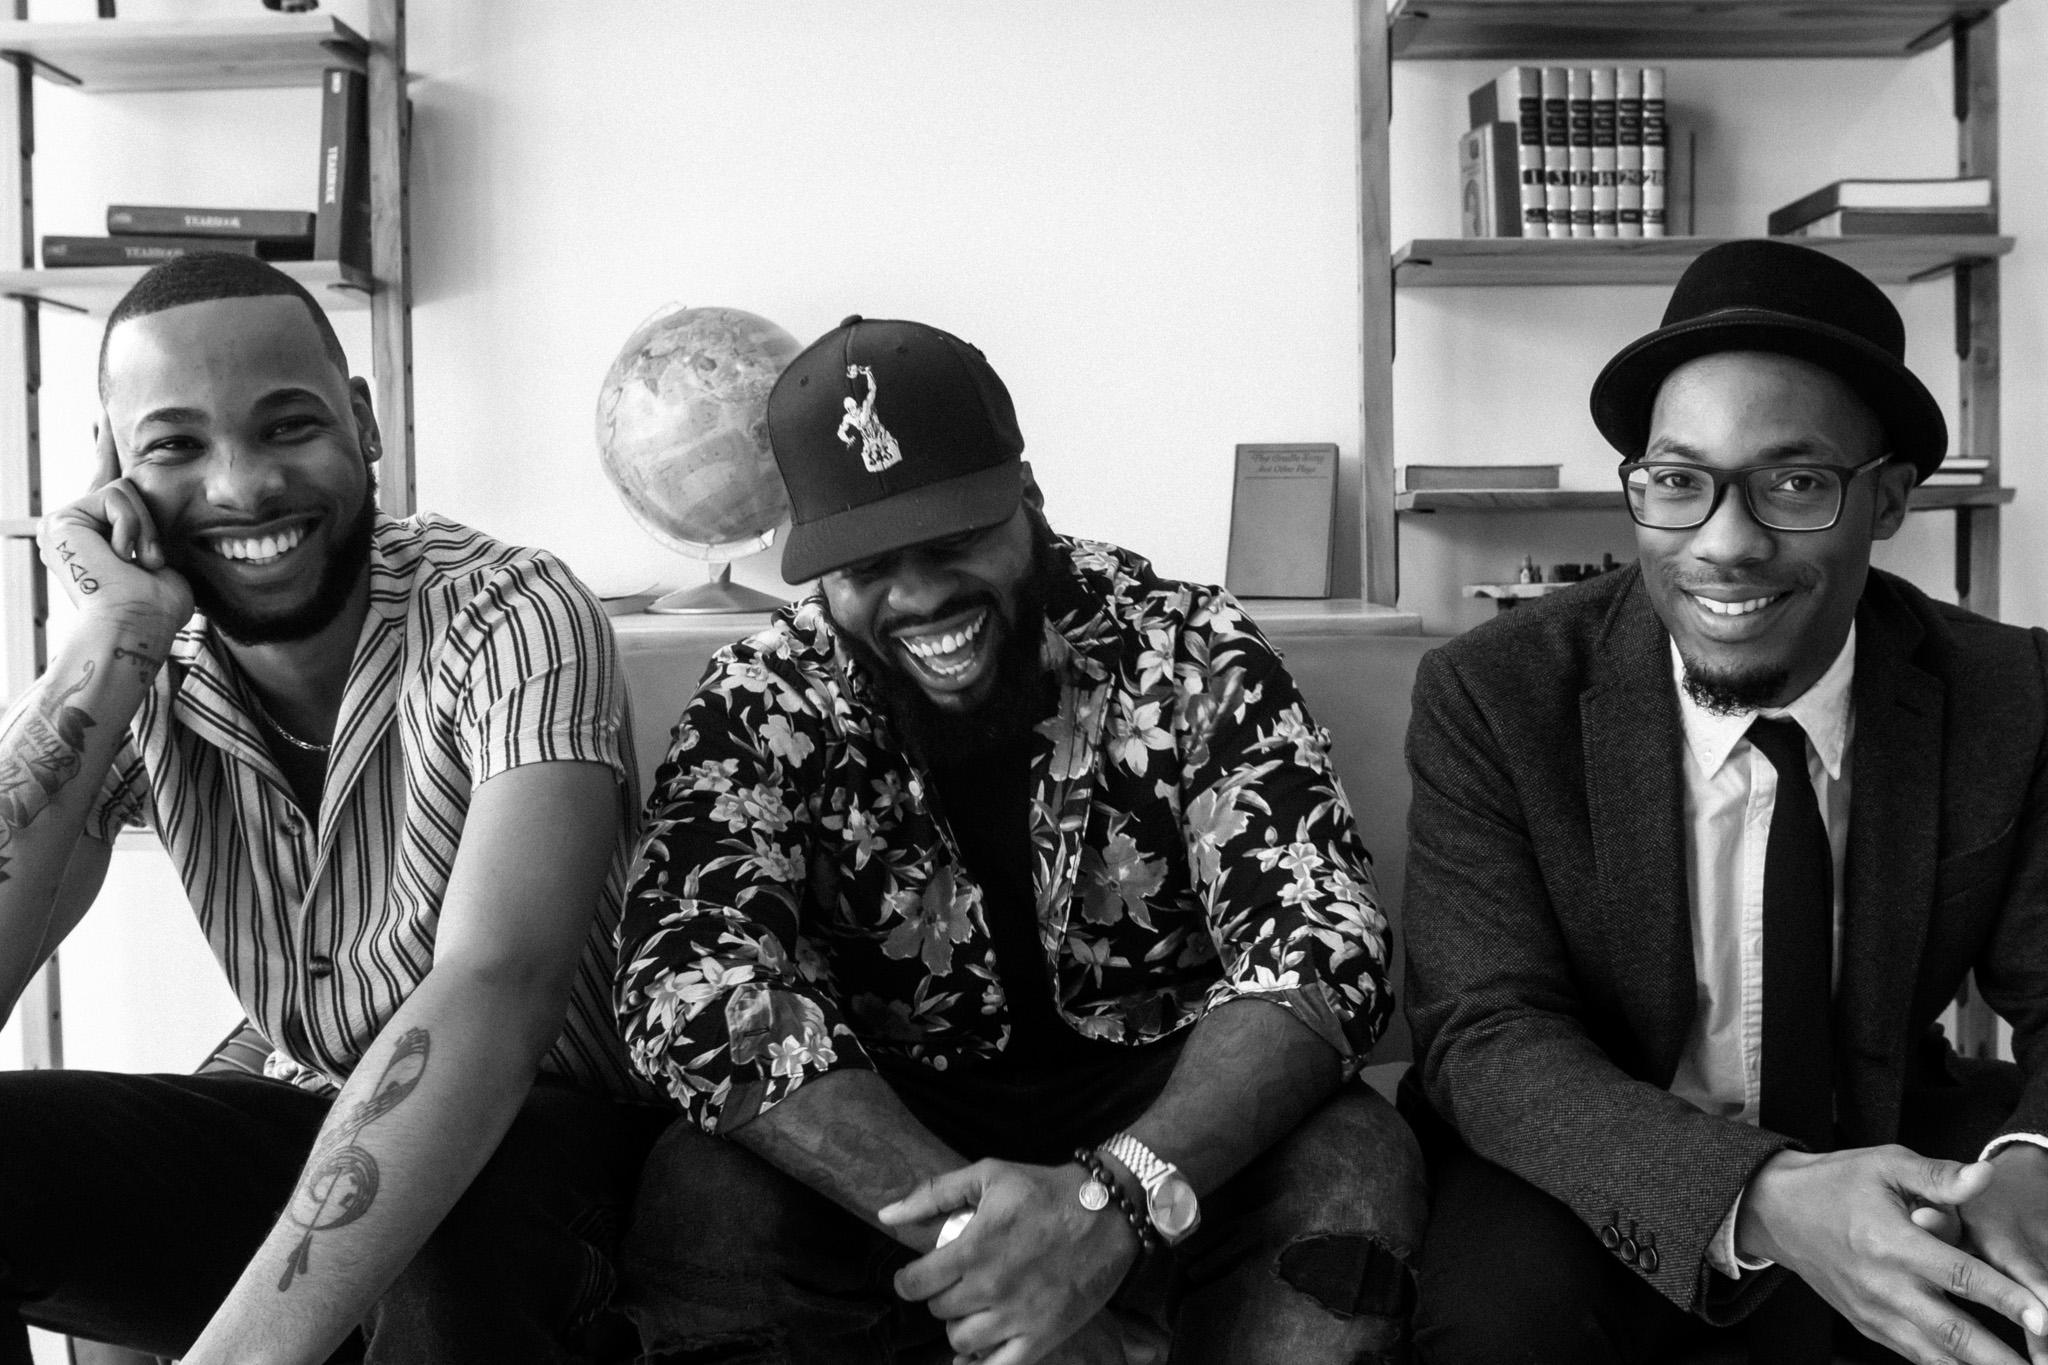 From left to right: Justin Swiney, BD3 & FKAjazz